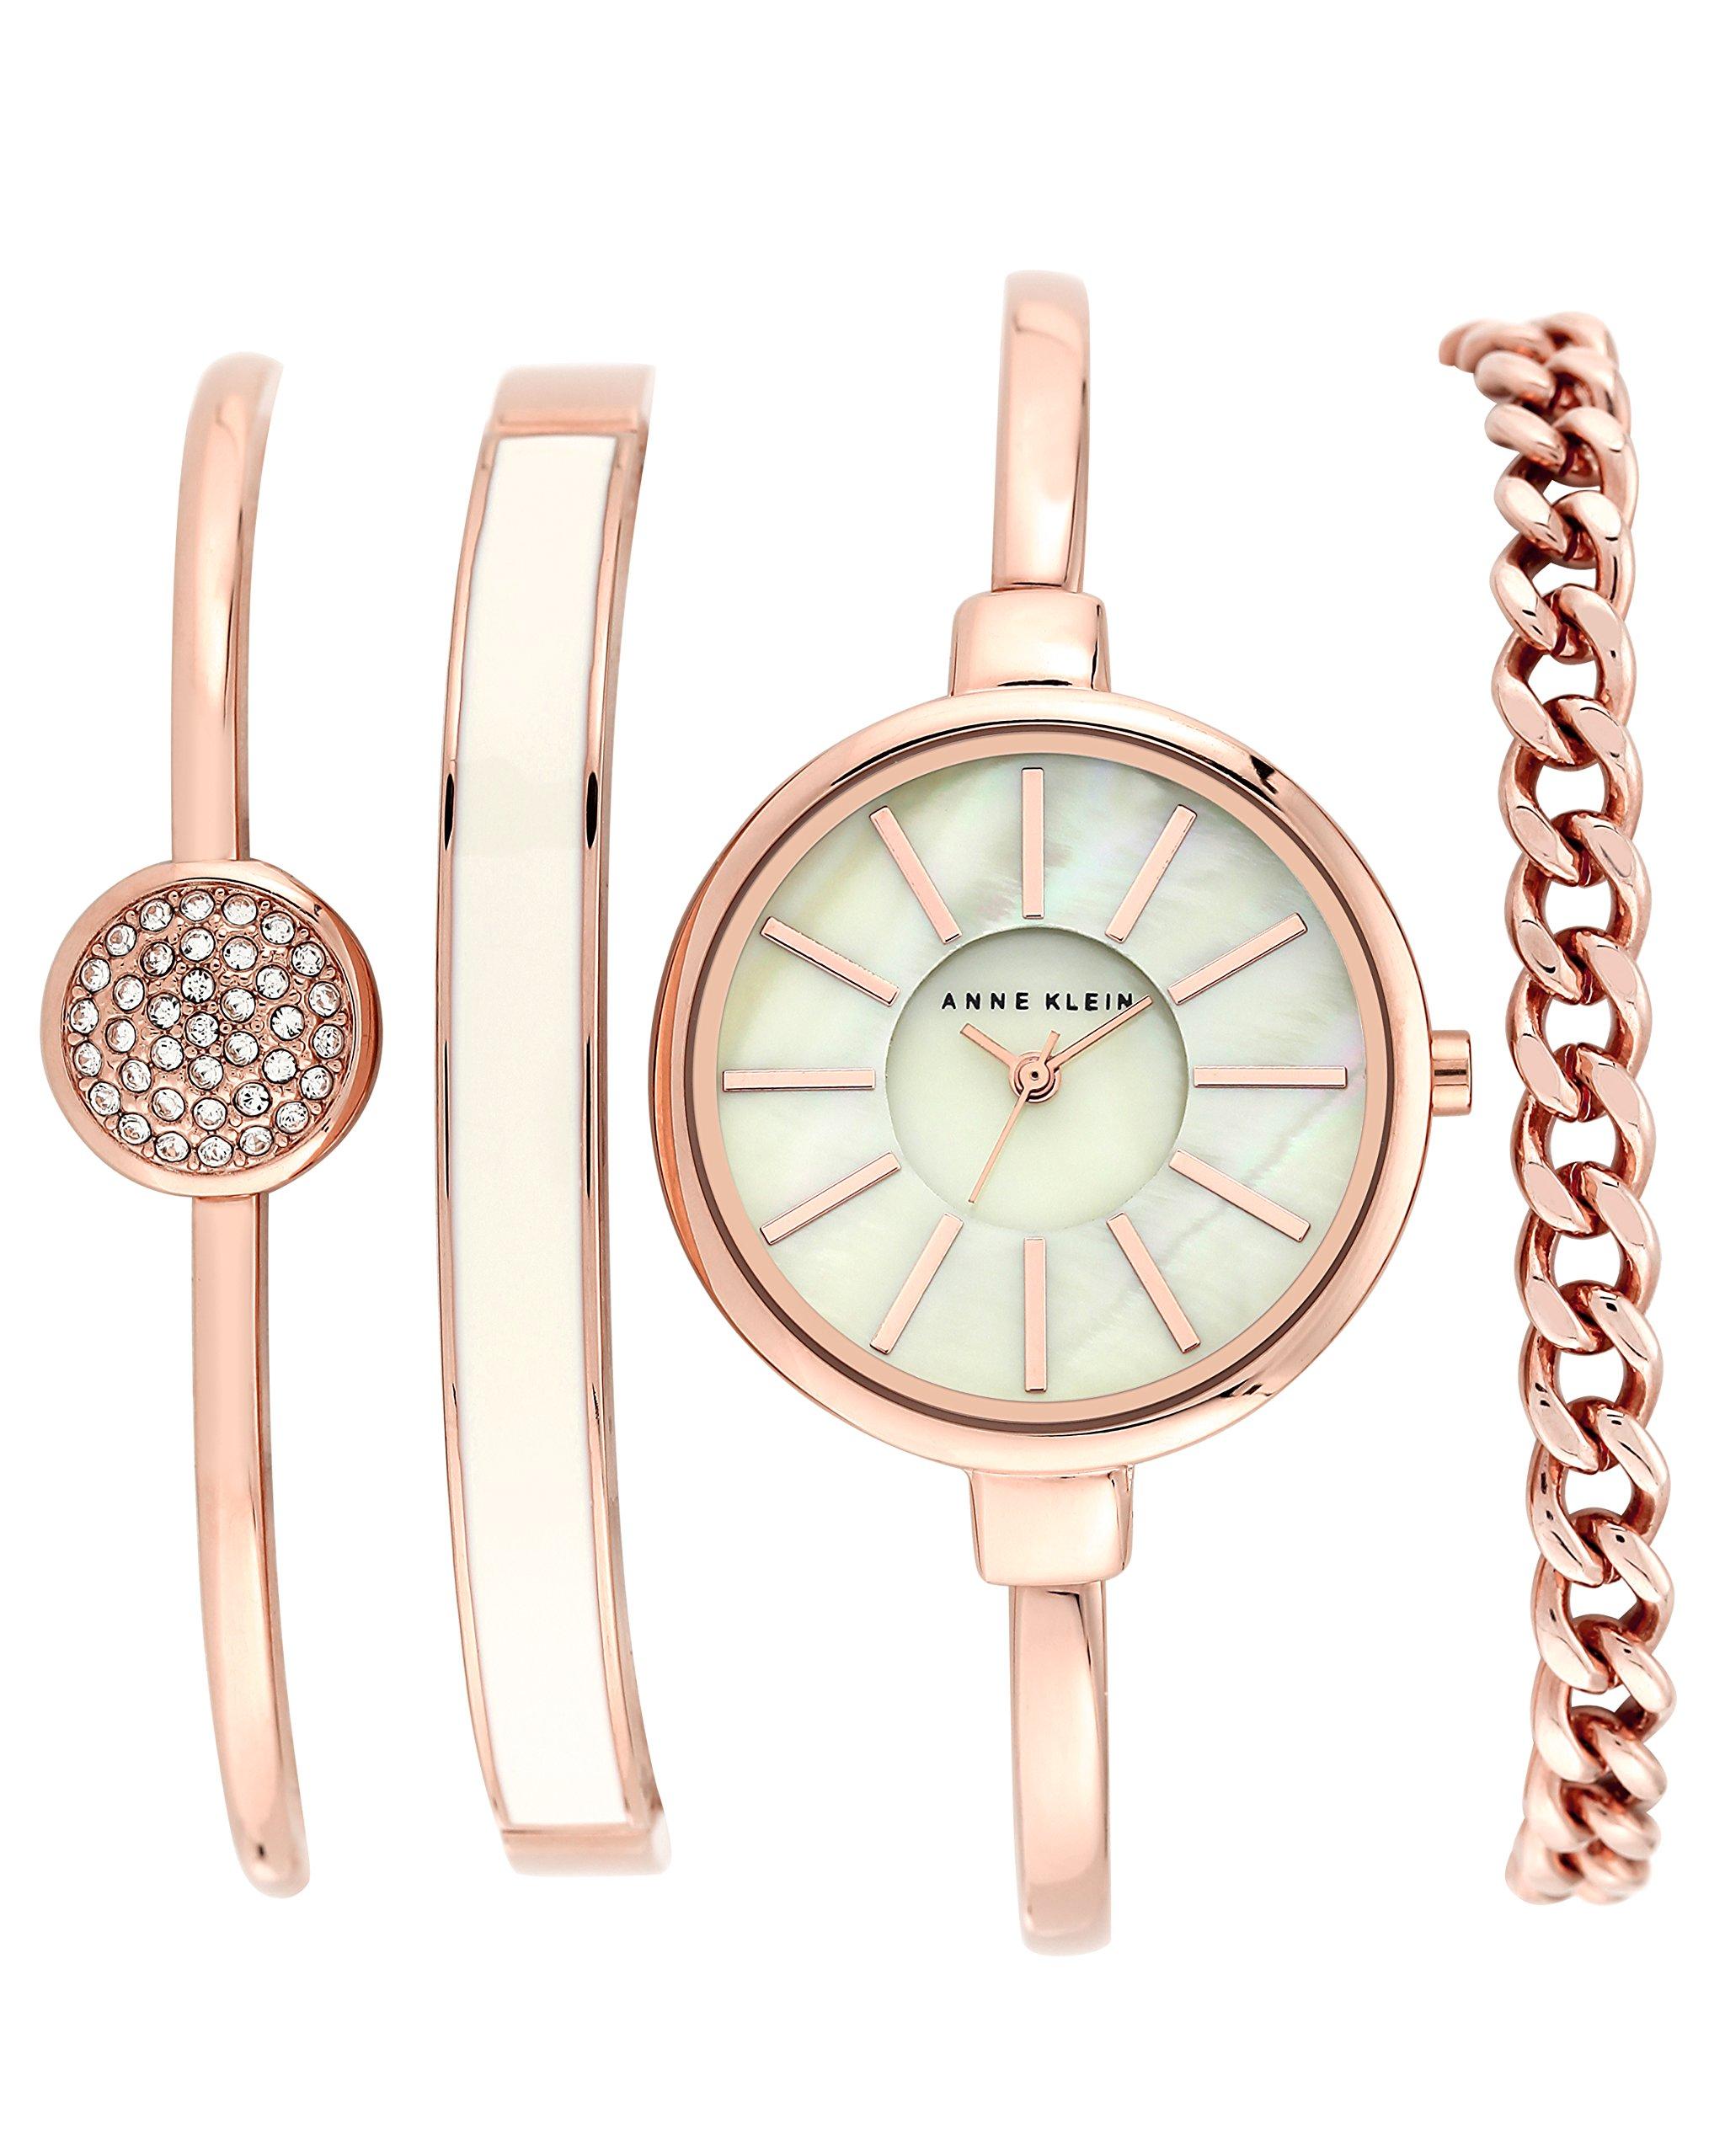 Anne Klein Women's AK/1470RGST Rose Gold-Tone Bangle Watch and Swarovski Crystal Bracelet Set by Anne Klein